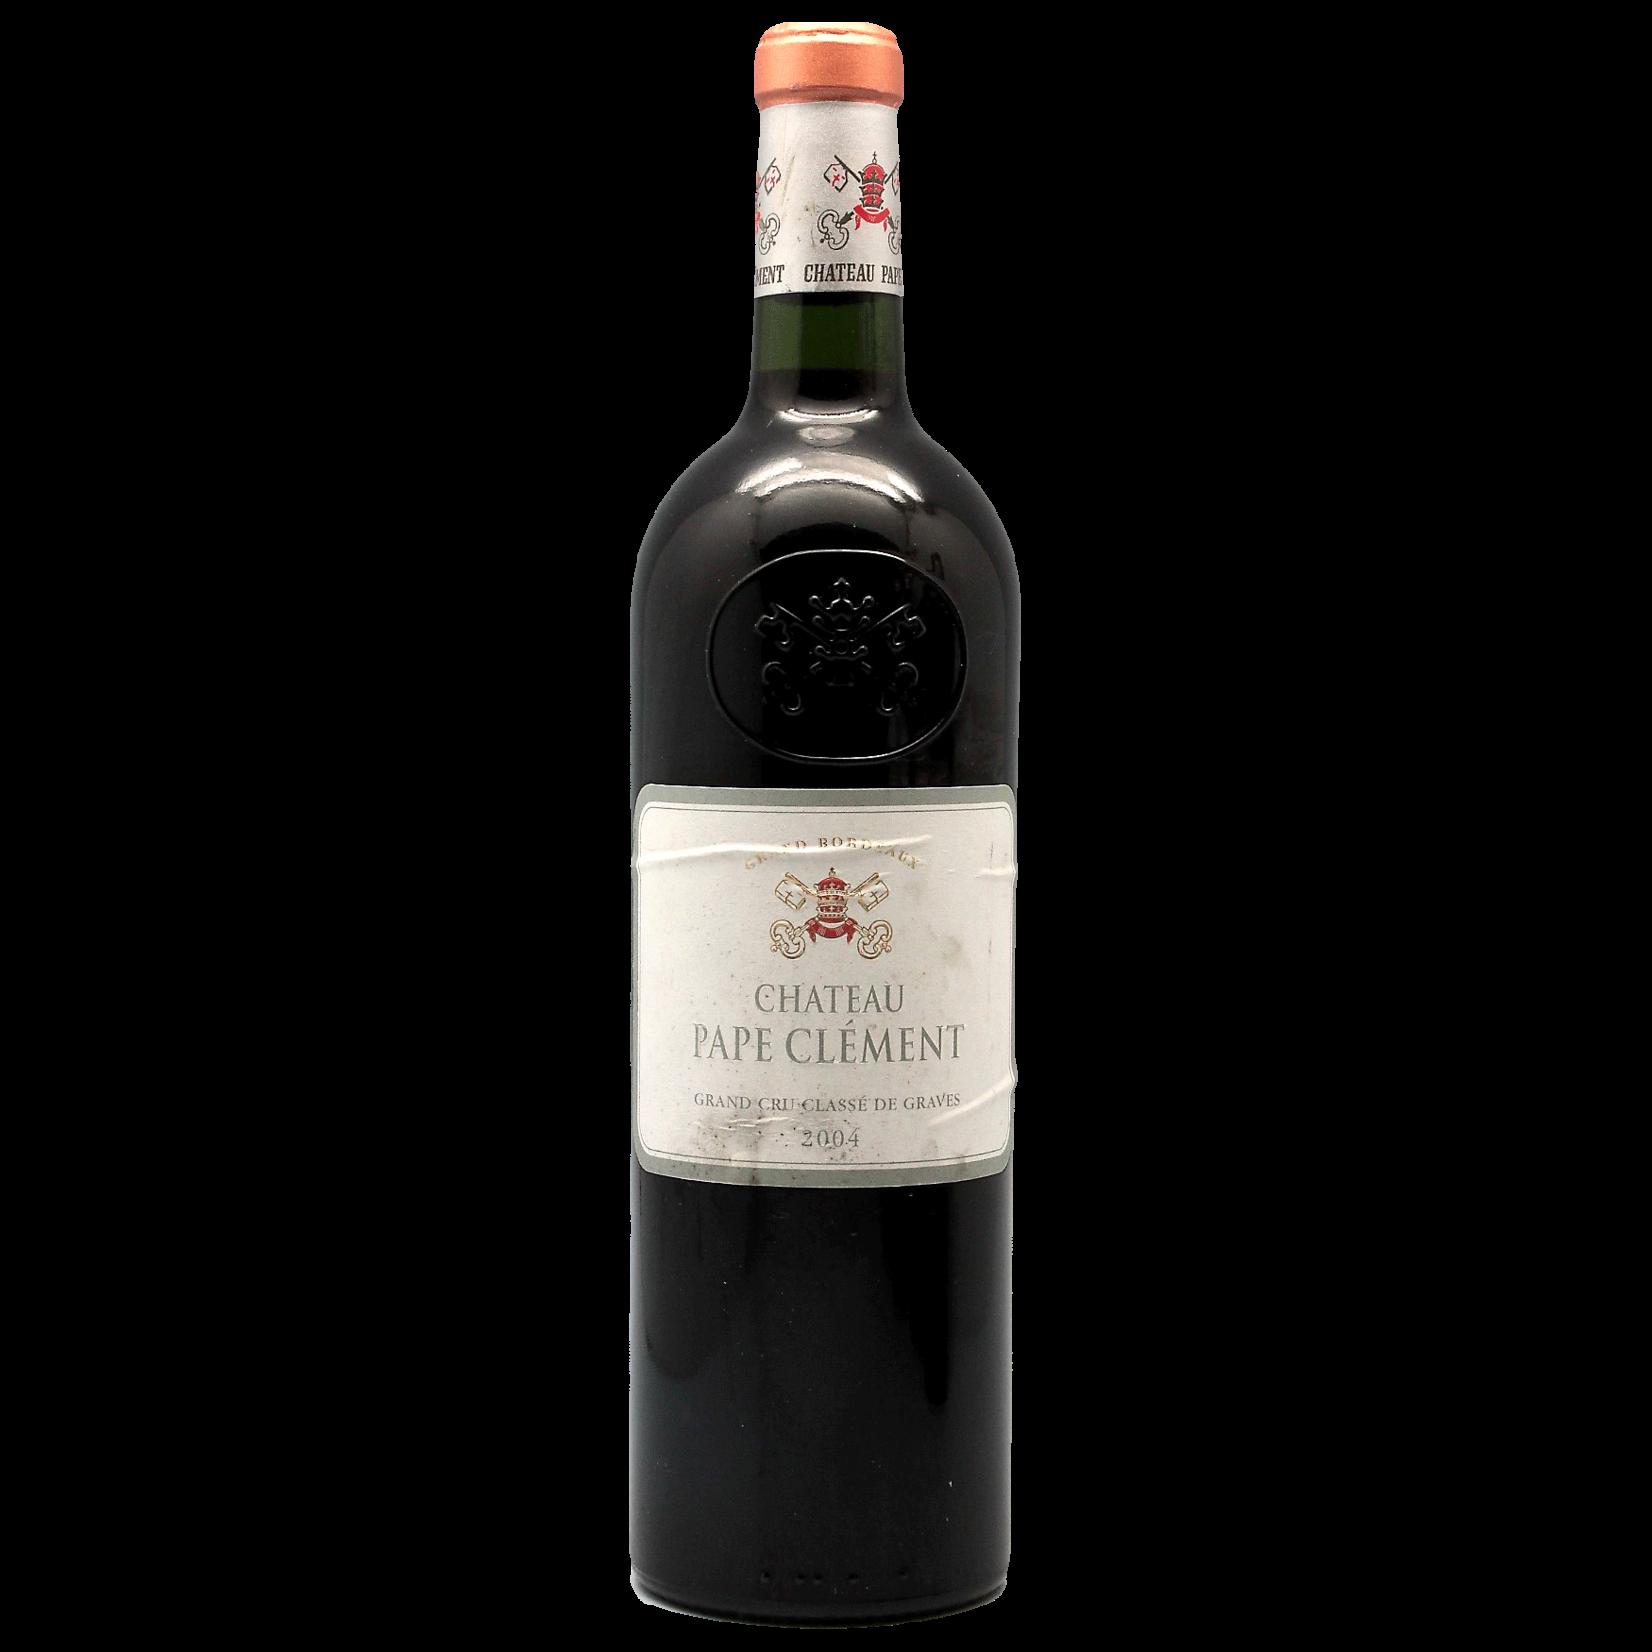 Wine Chateau Pape Clement 2004